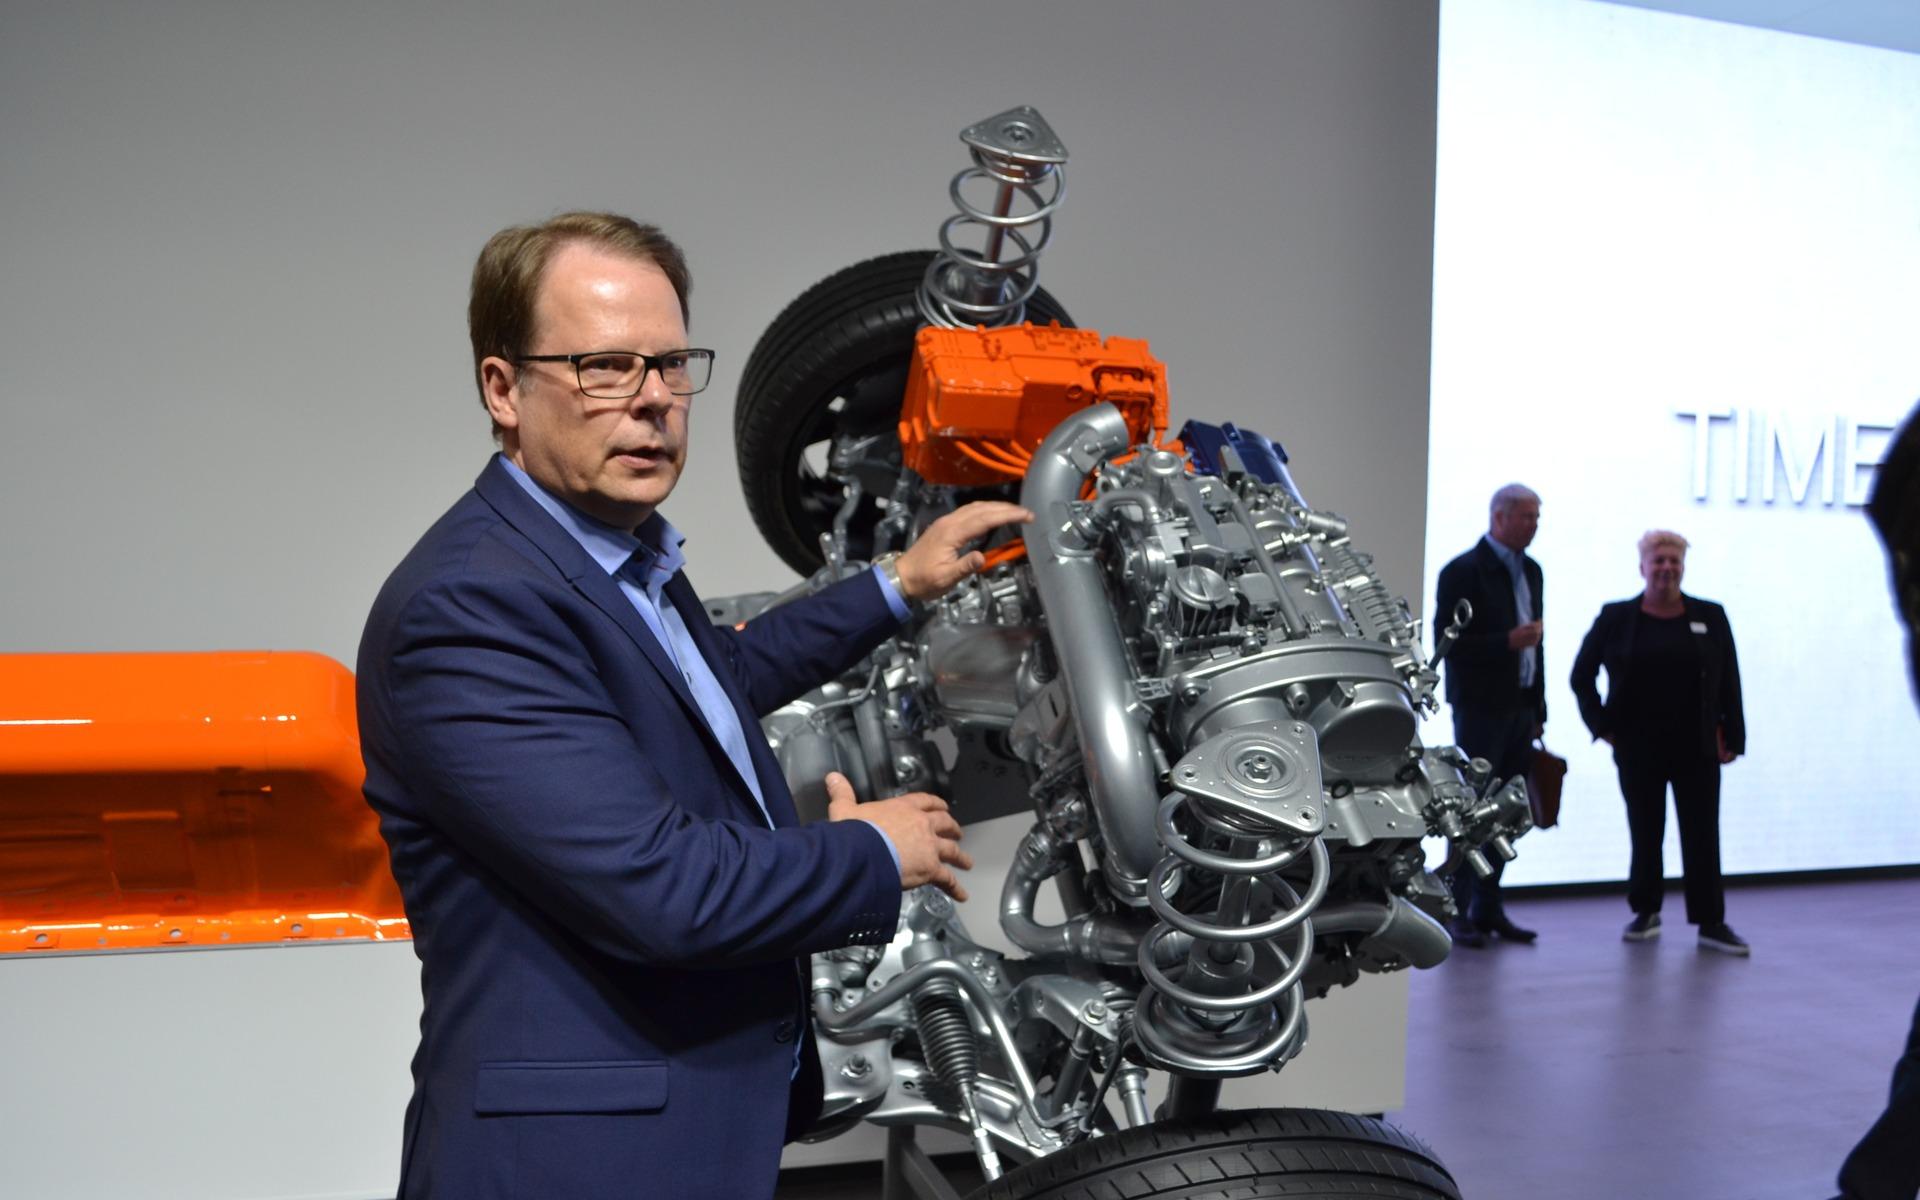 The new T5 hybrid powertrain